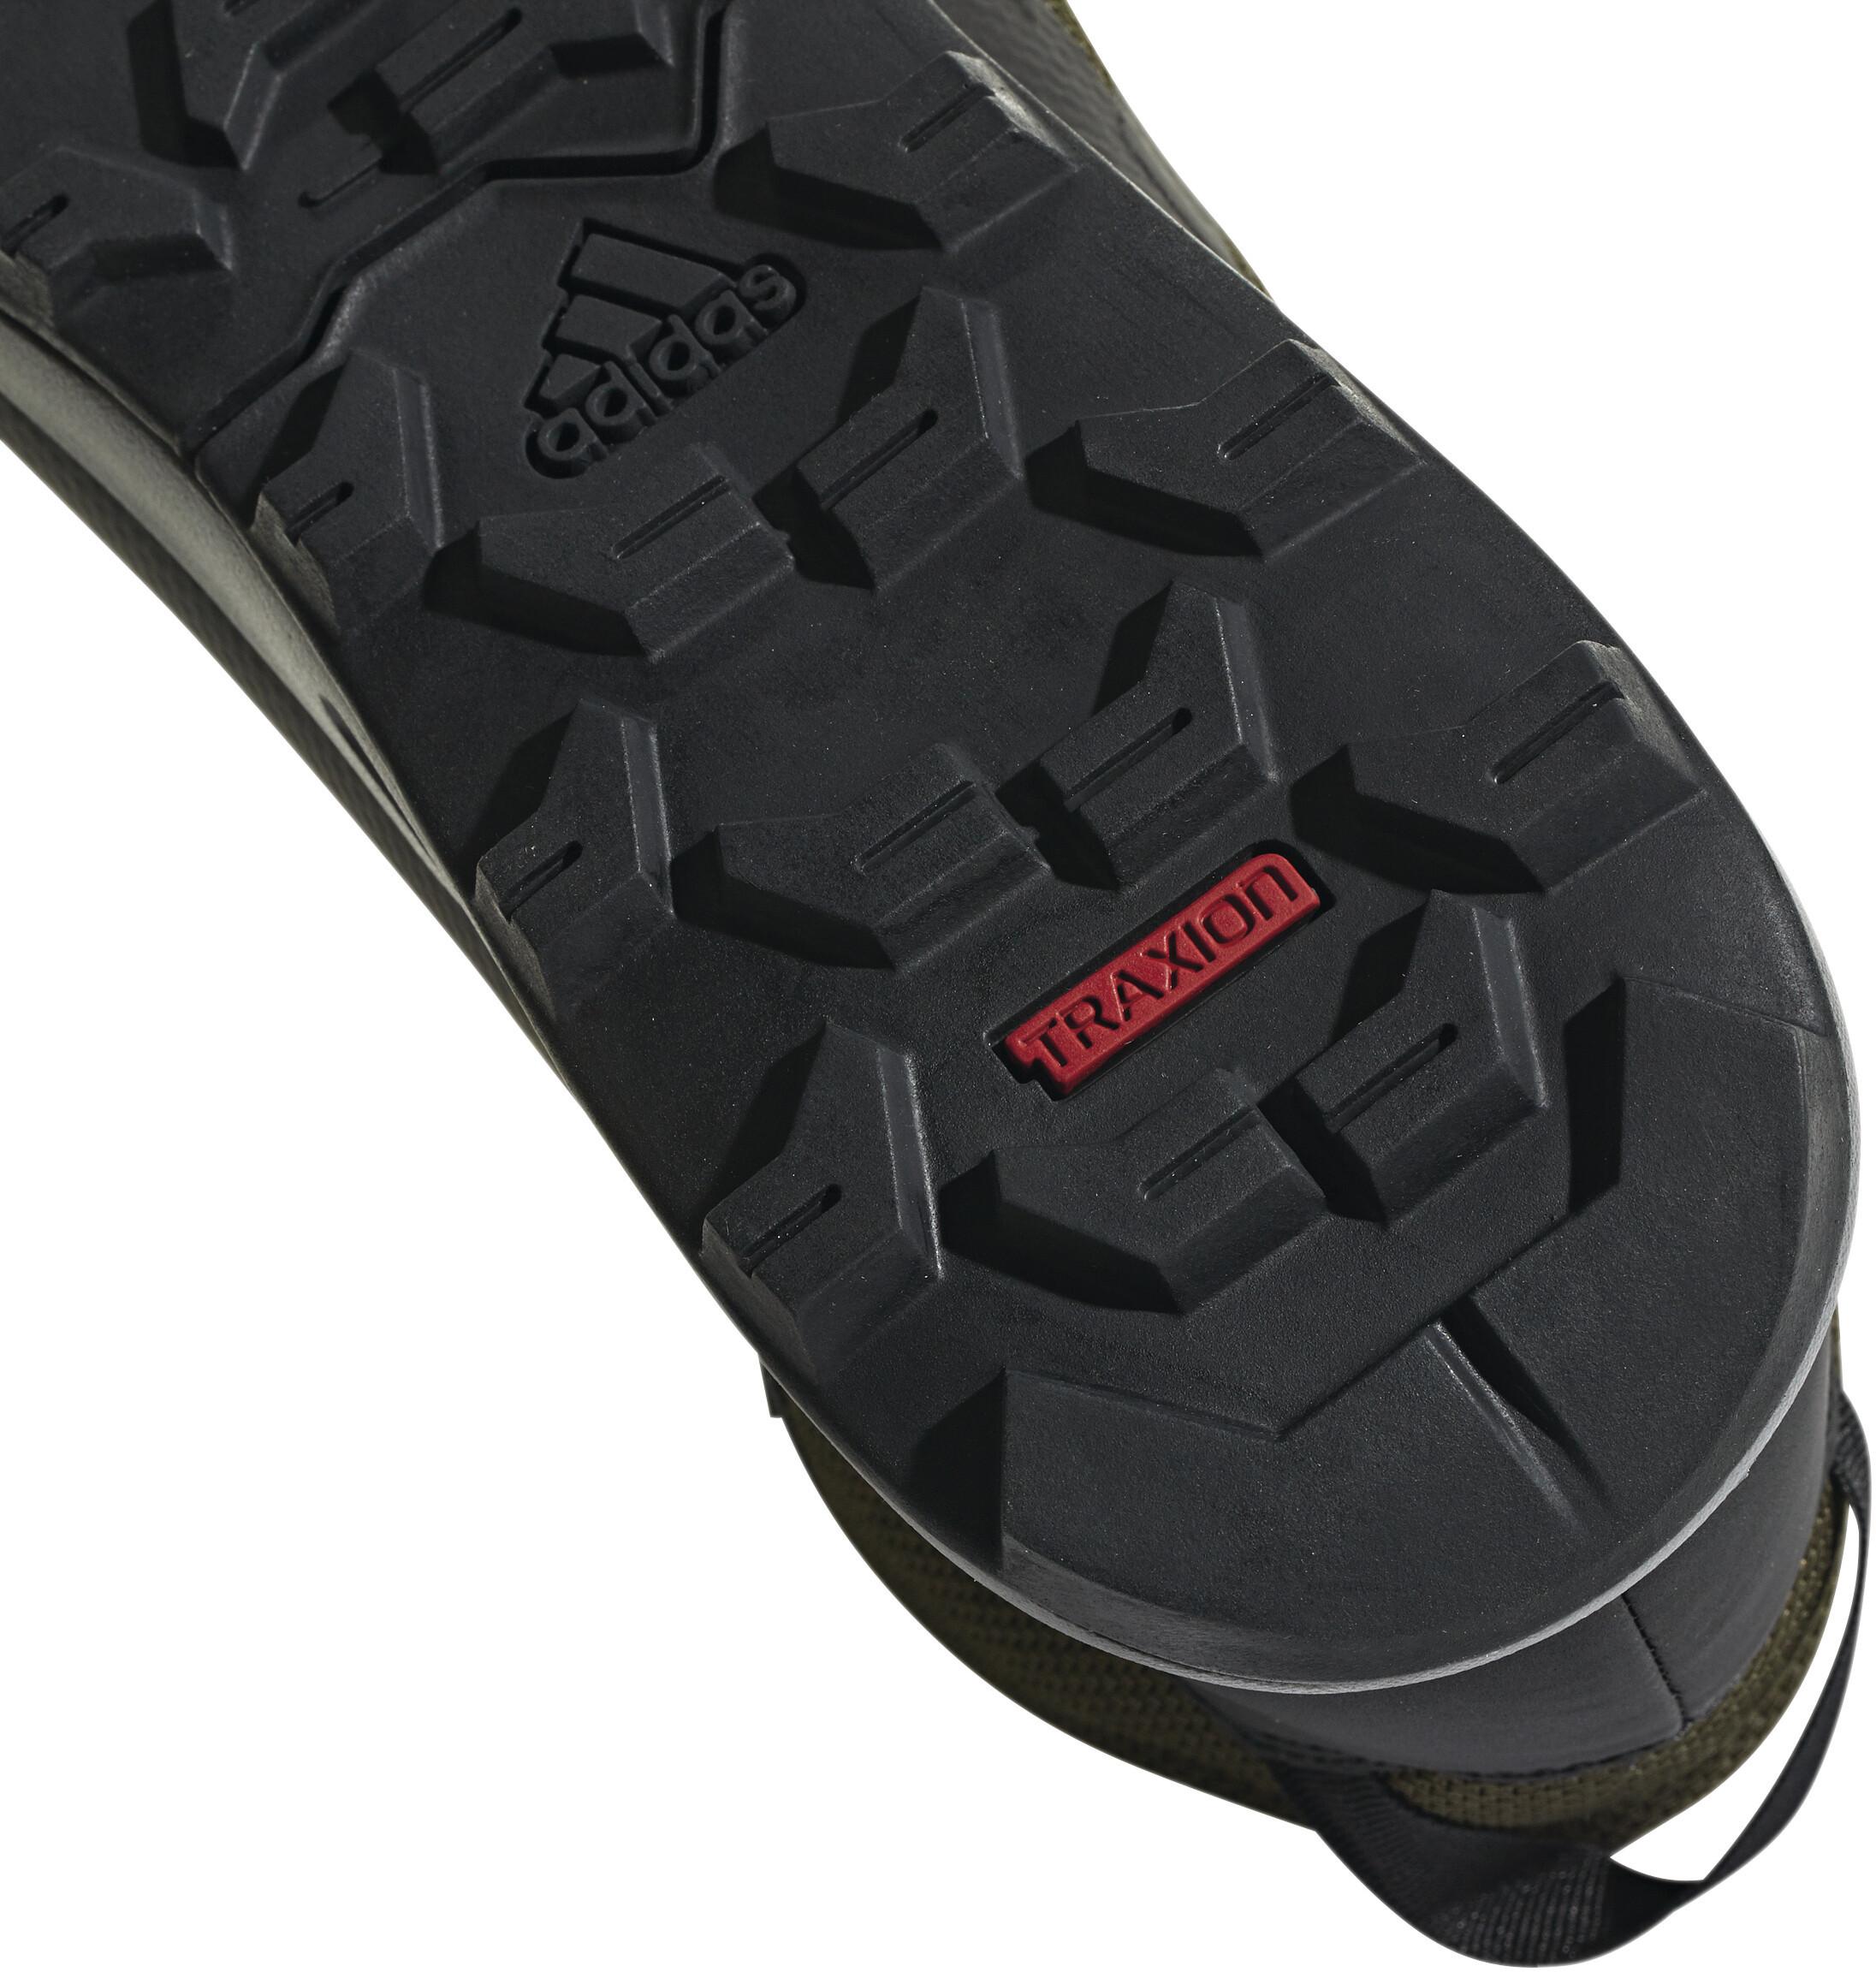 best sneakers 714cb 0d84c adidas TERREX Tivid ClimaProof - Chaussures Homme - noir